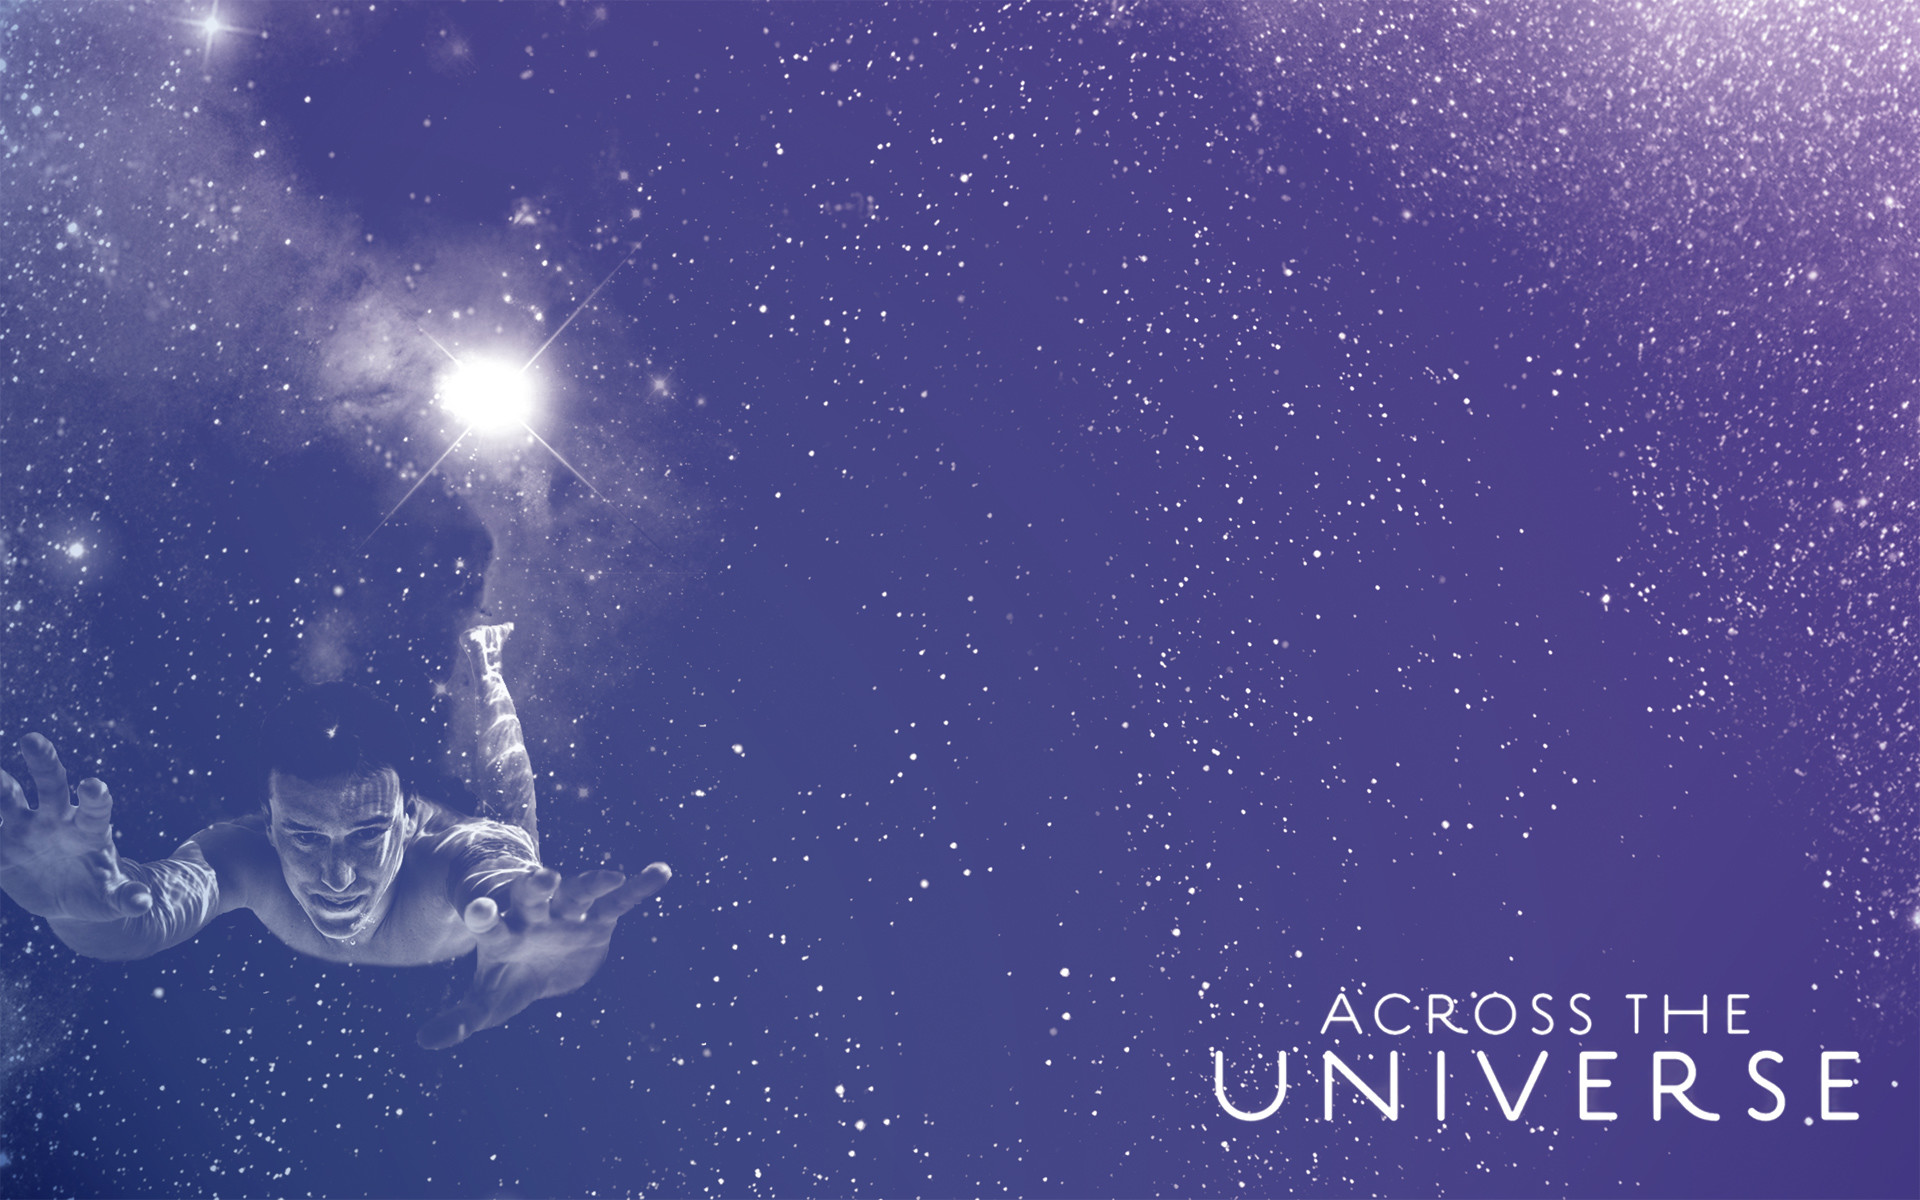 Universe Desktop Wallpapers – Across the Universe Trilogy Wallpaper .